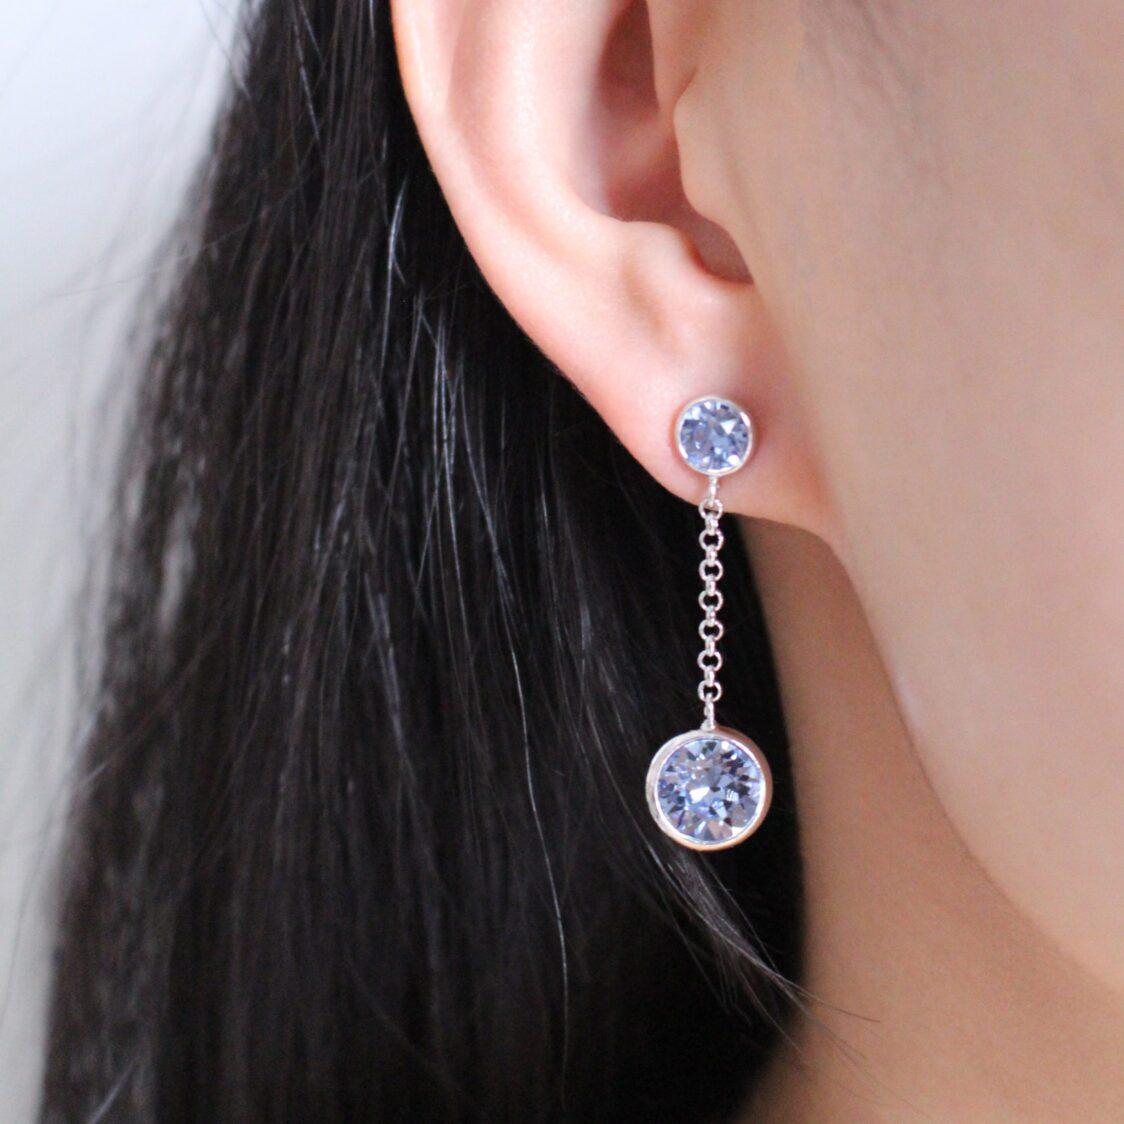 Astell S63 Earring